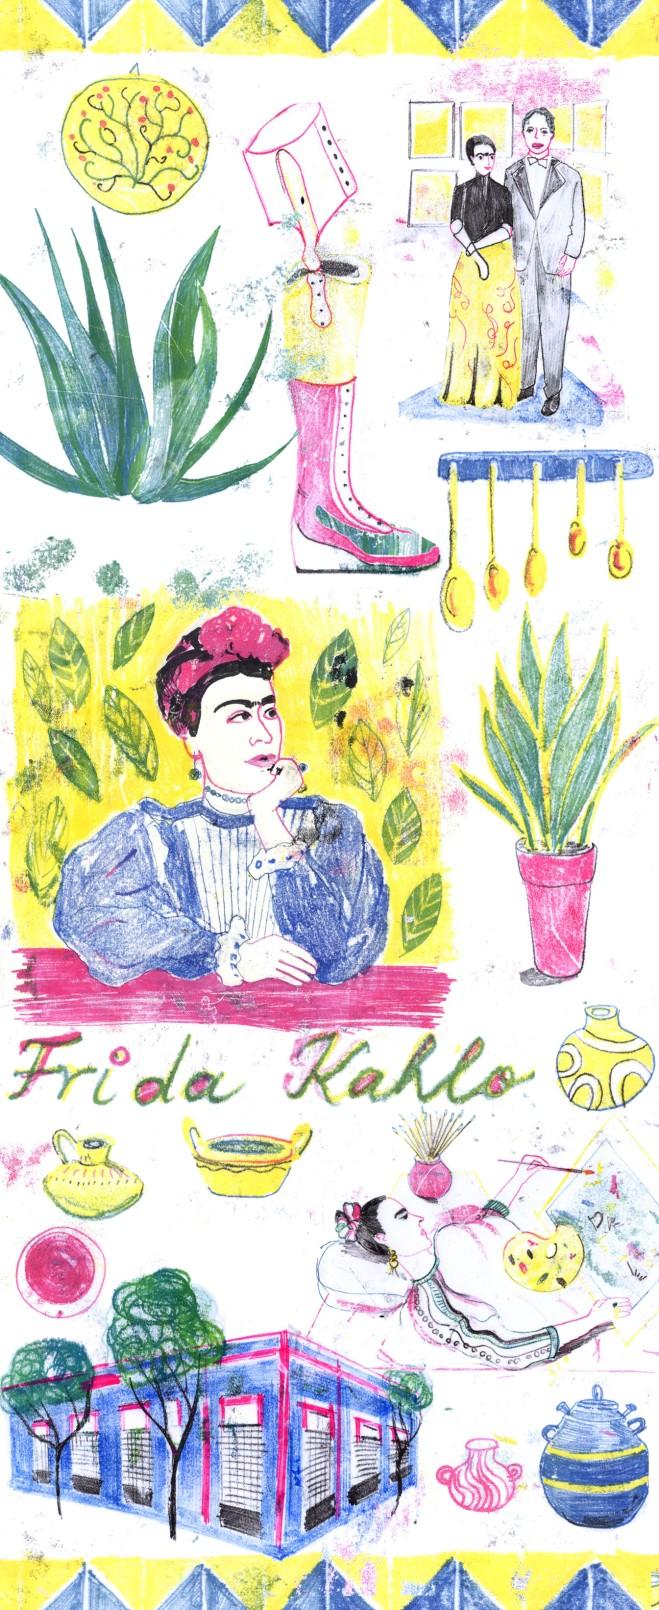 editorial illustrations arindacraciun portrait doodle artist painter